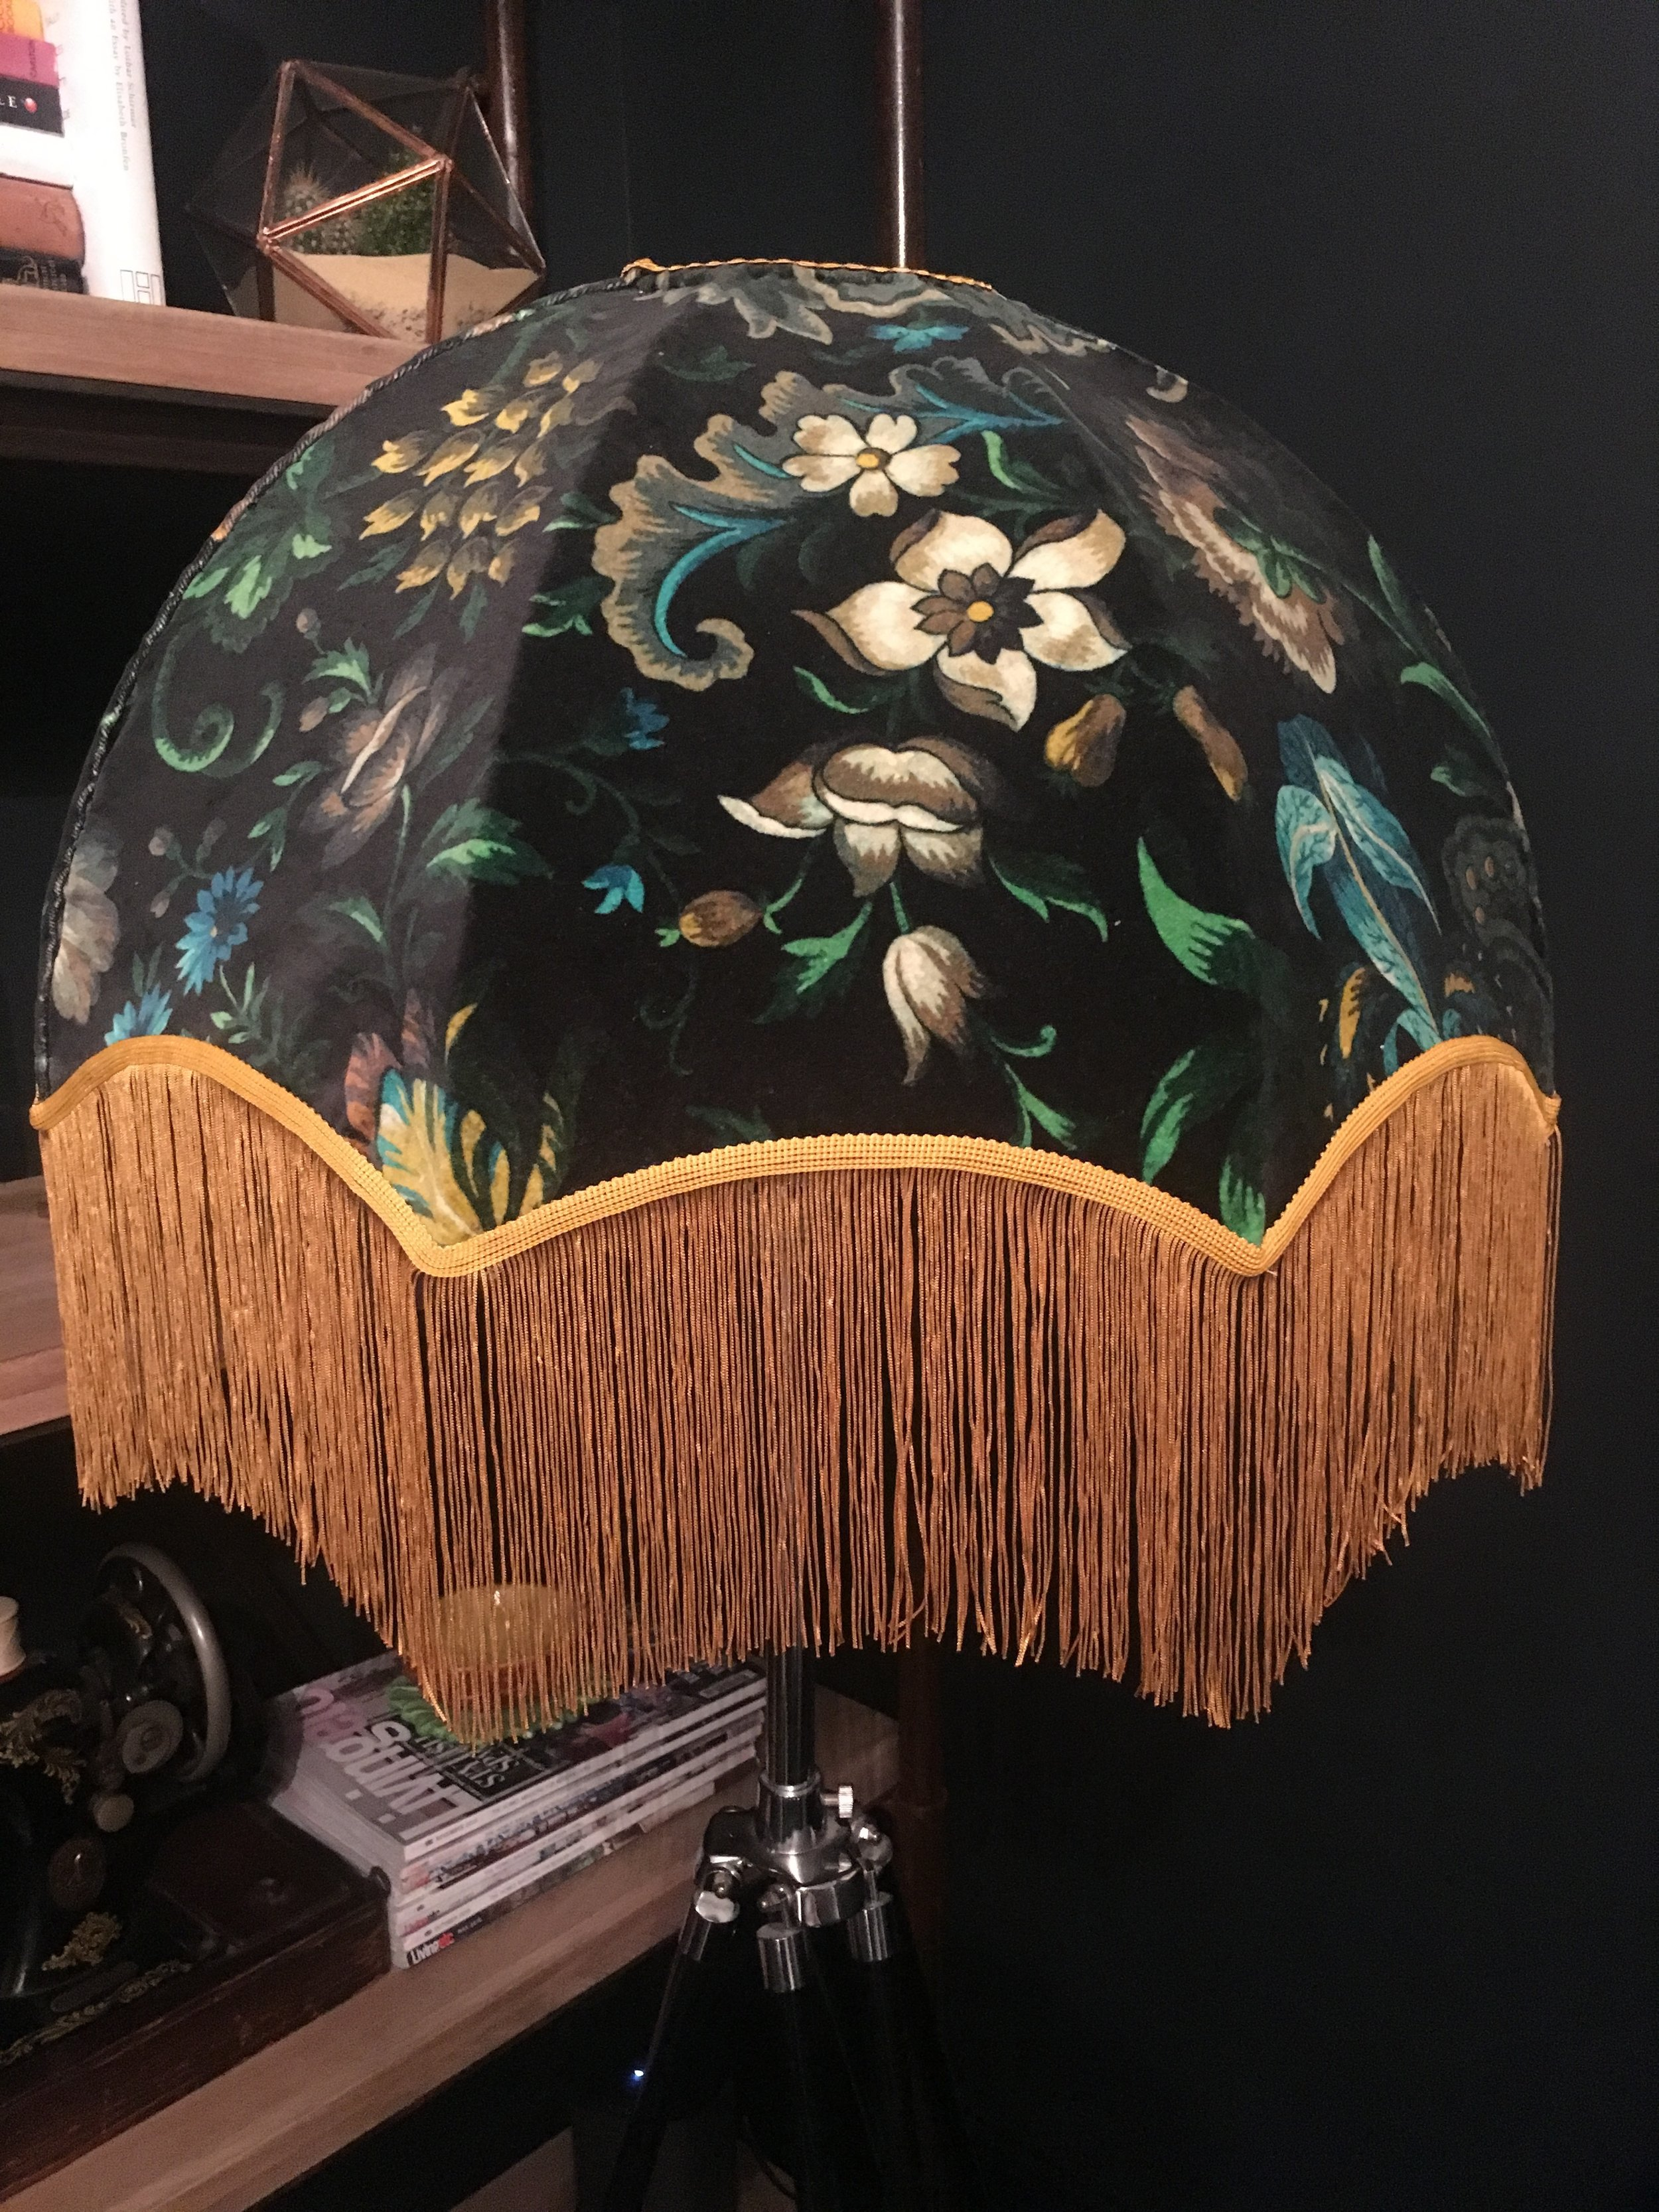 {SAVY SHOPPING} THE HOUSE OF HACKNEY HACK- DIY LAMPSHADE